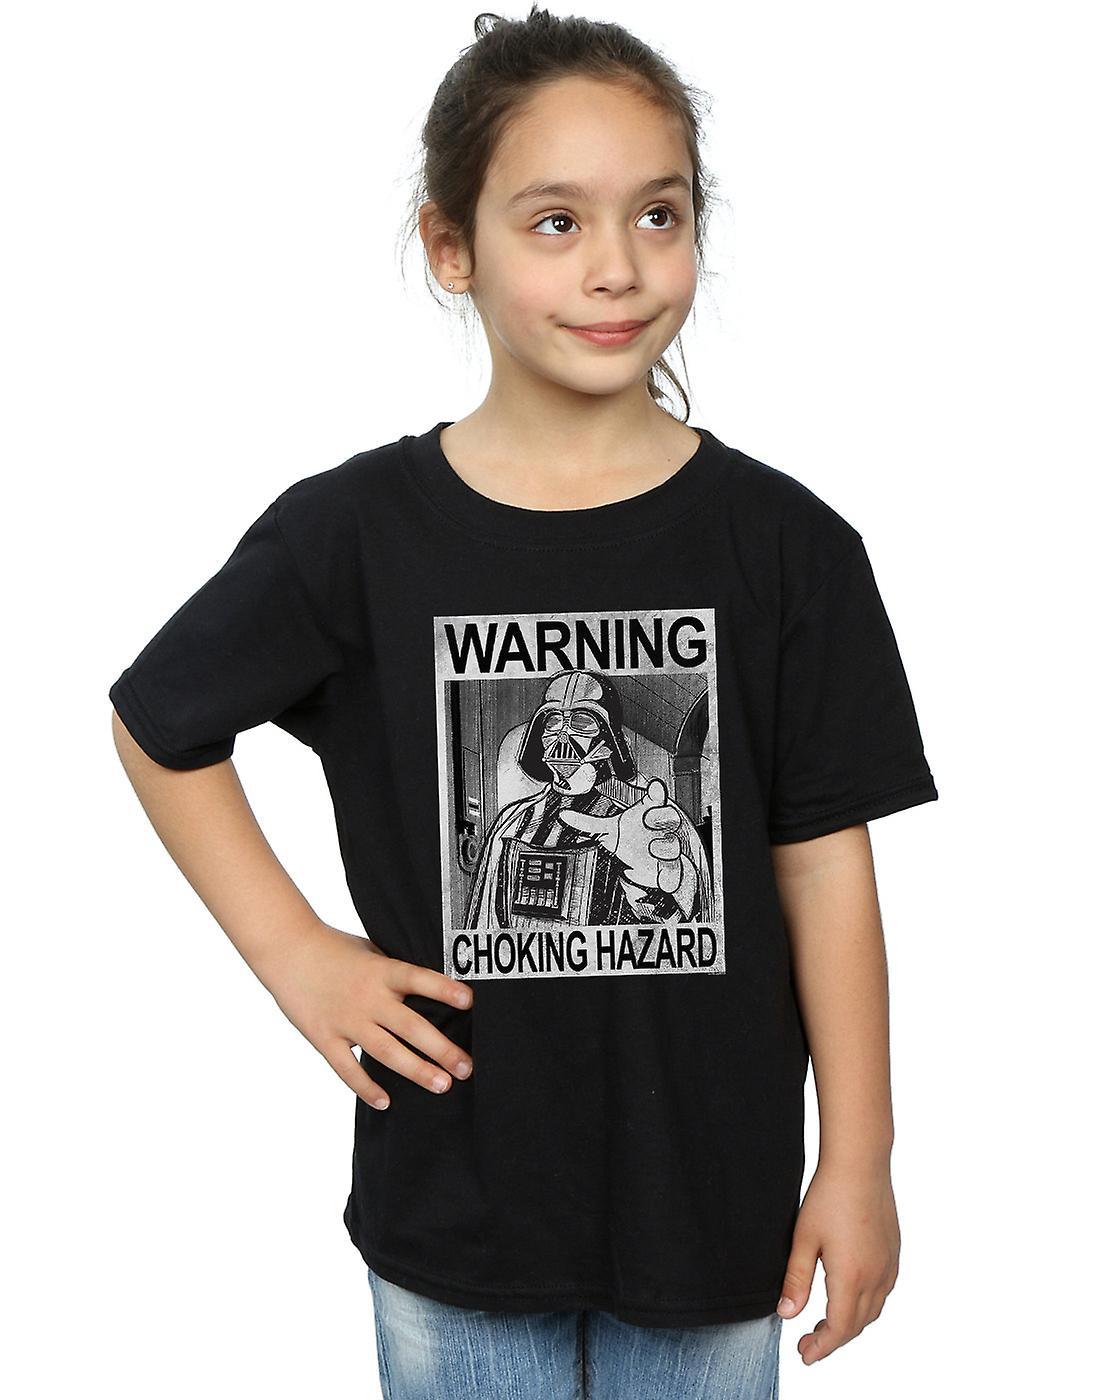 Star Wars Girls Vader Choking Hazard T-Shirt